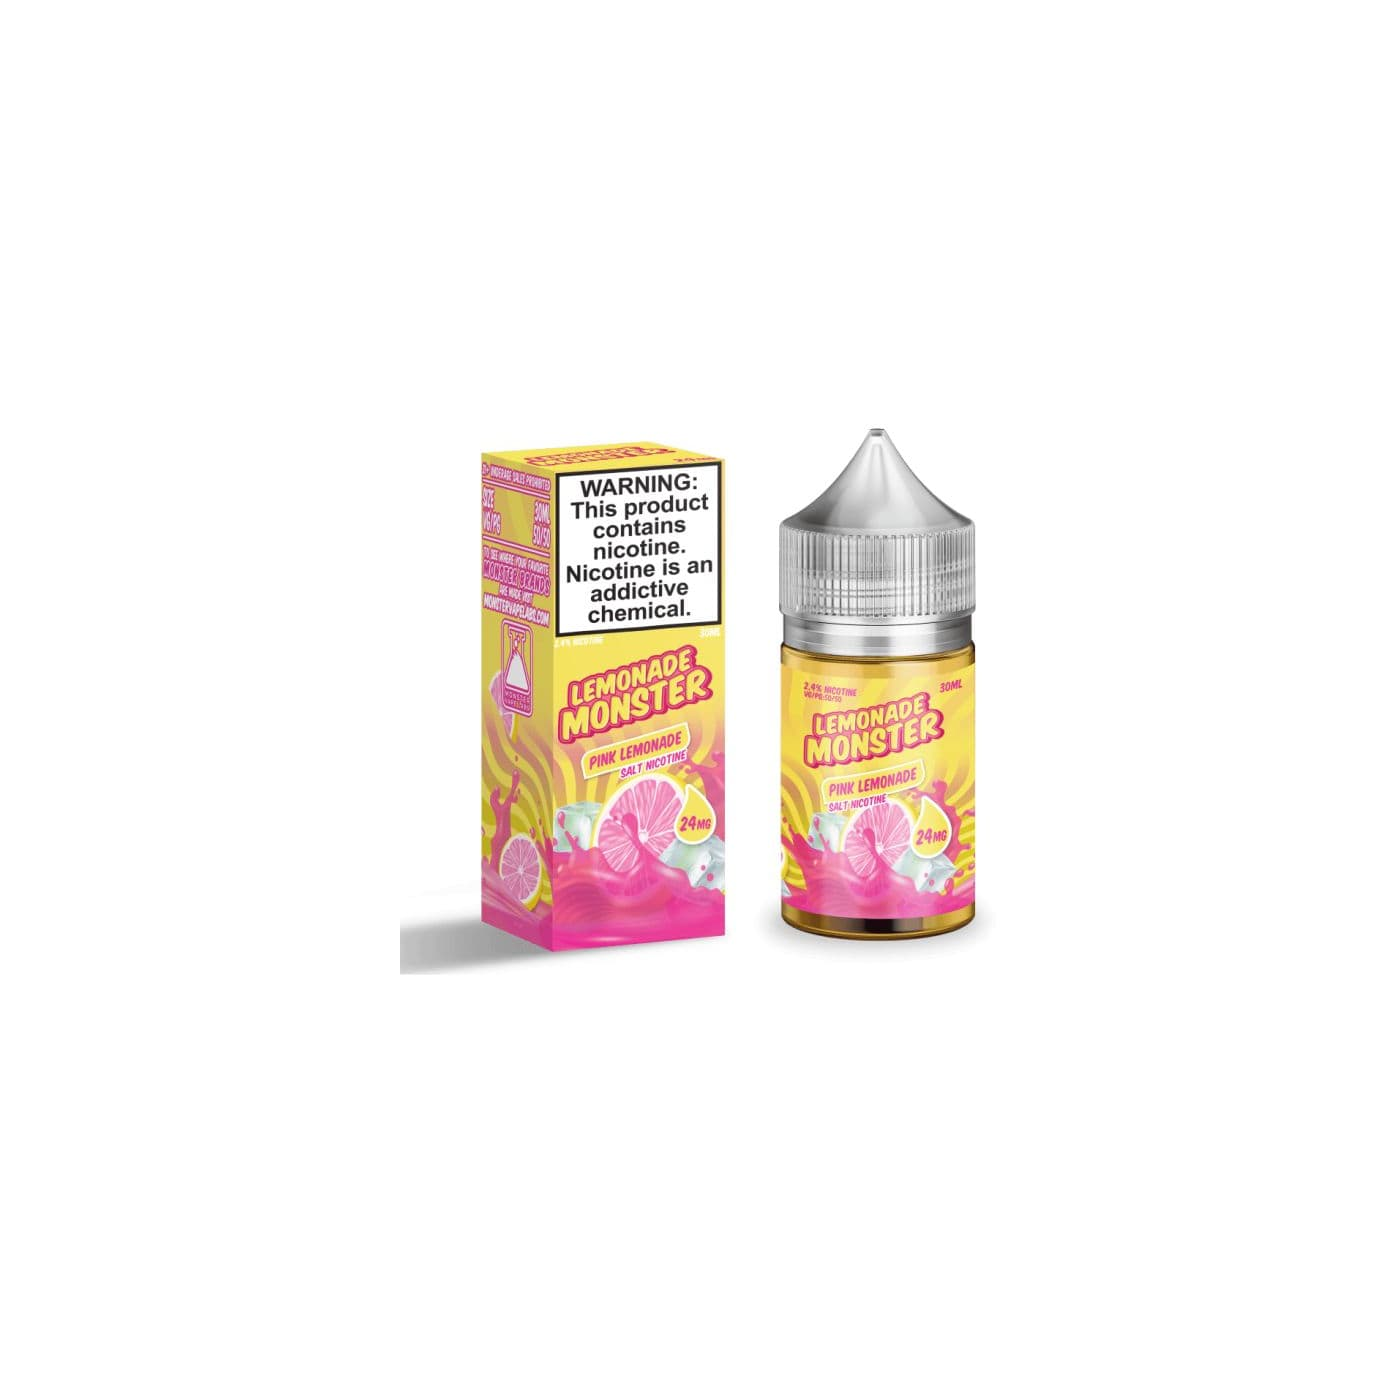 Lemonade Monster Salts Pink Lemonade